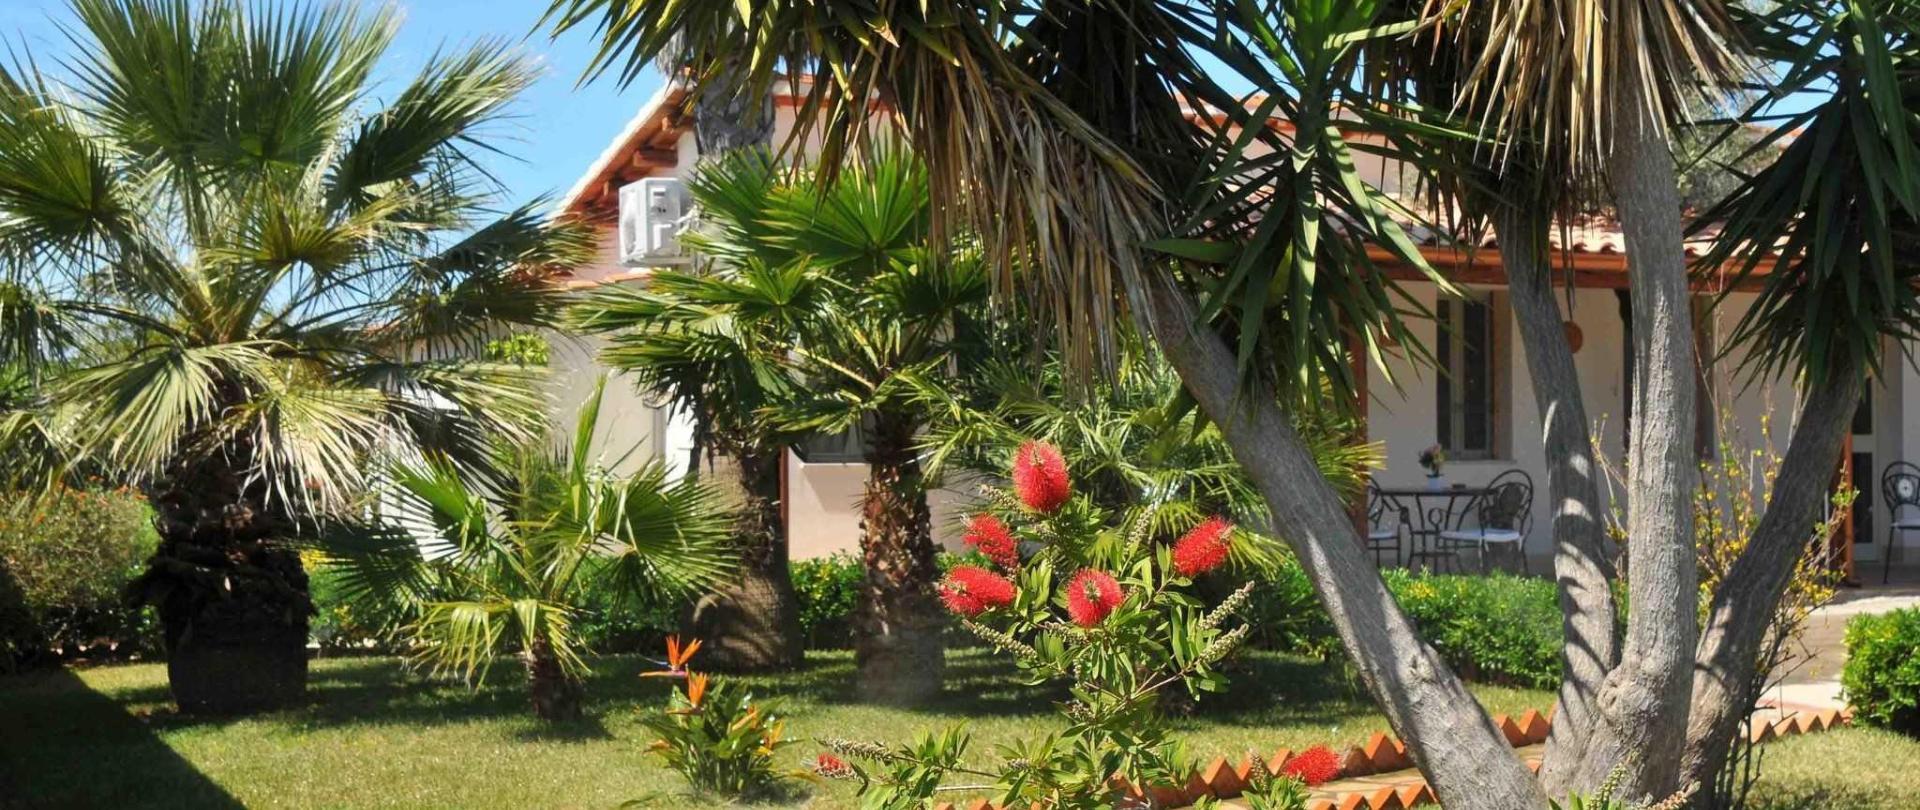 1_resort_noto_il_mandorleto_avola_villa_con_piscina_campagna_siciliana_24.JPG